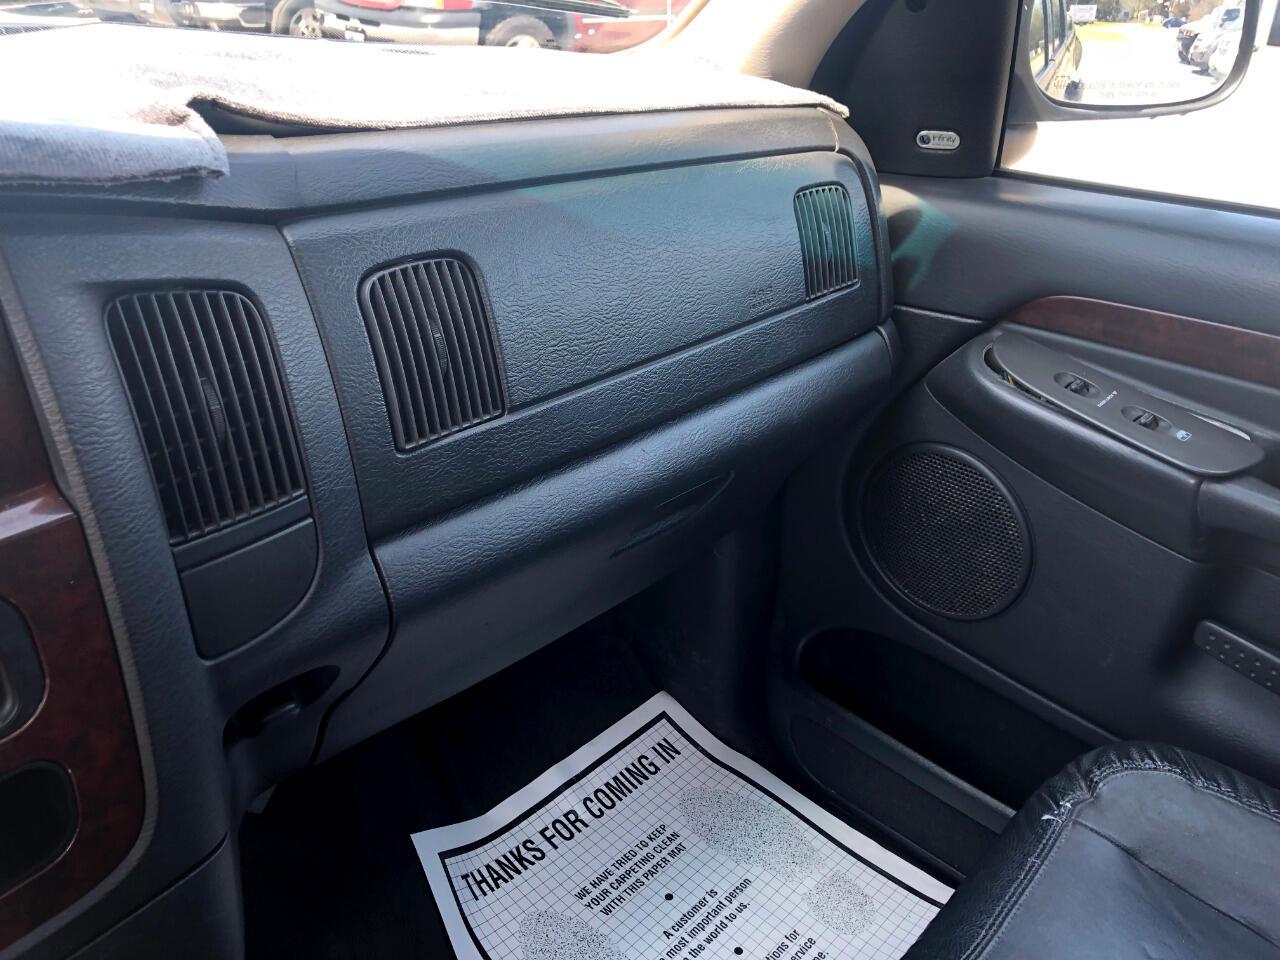 2003 Dodge Ram 1500 SLT Quad Cab 4WD